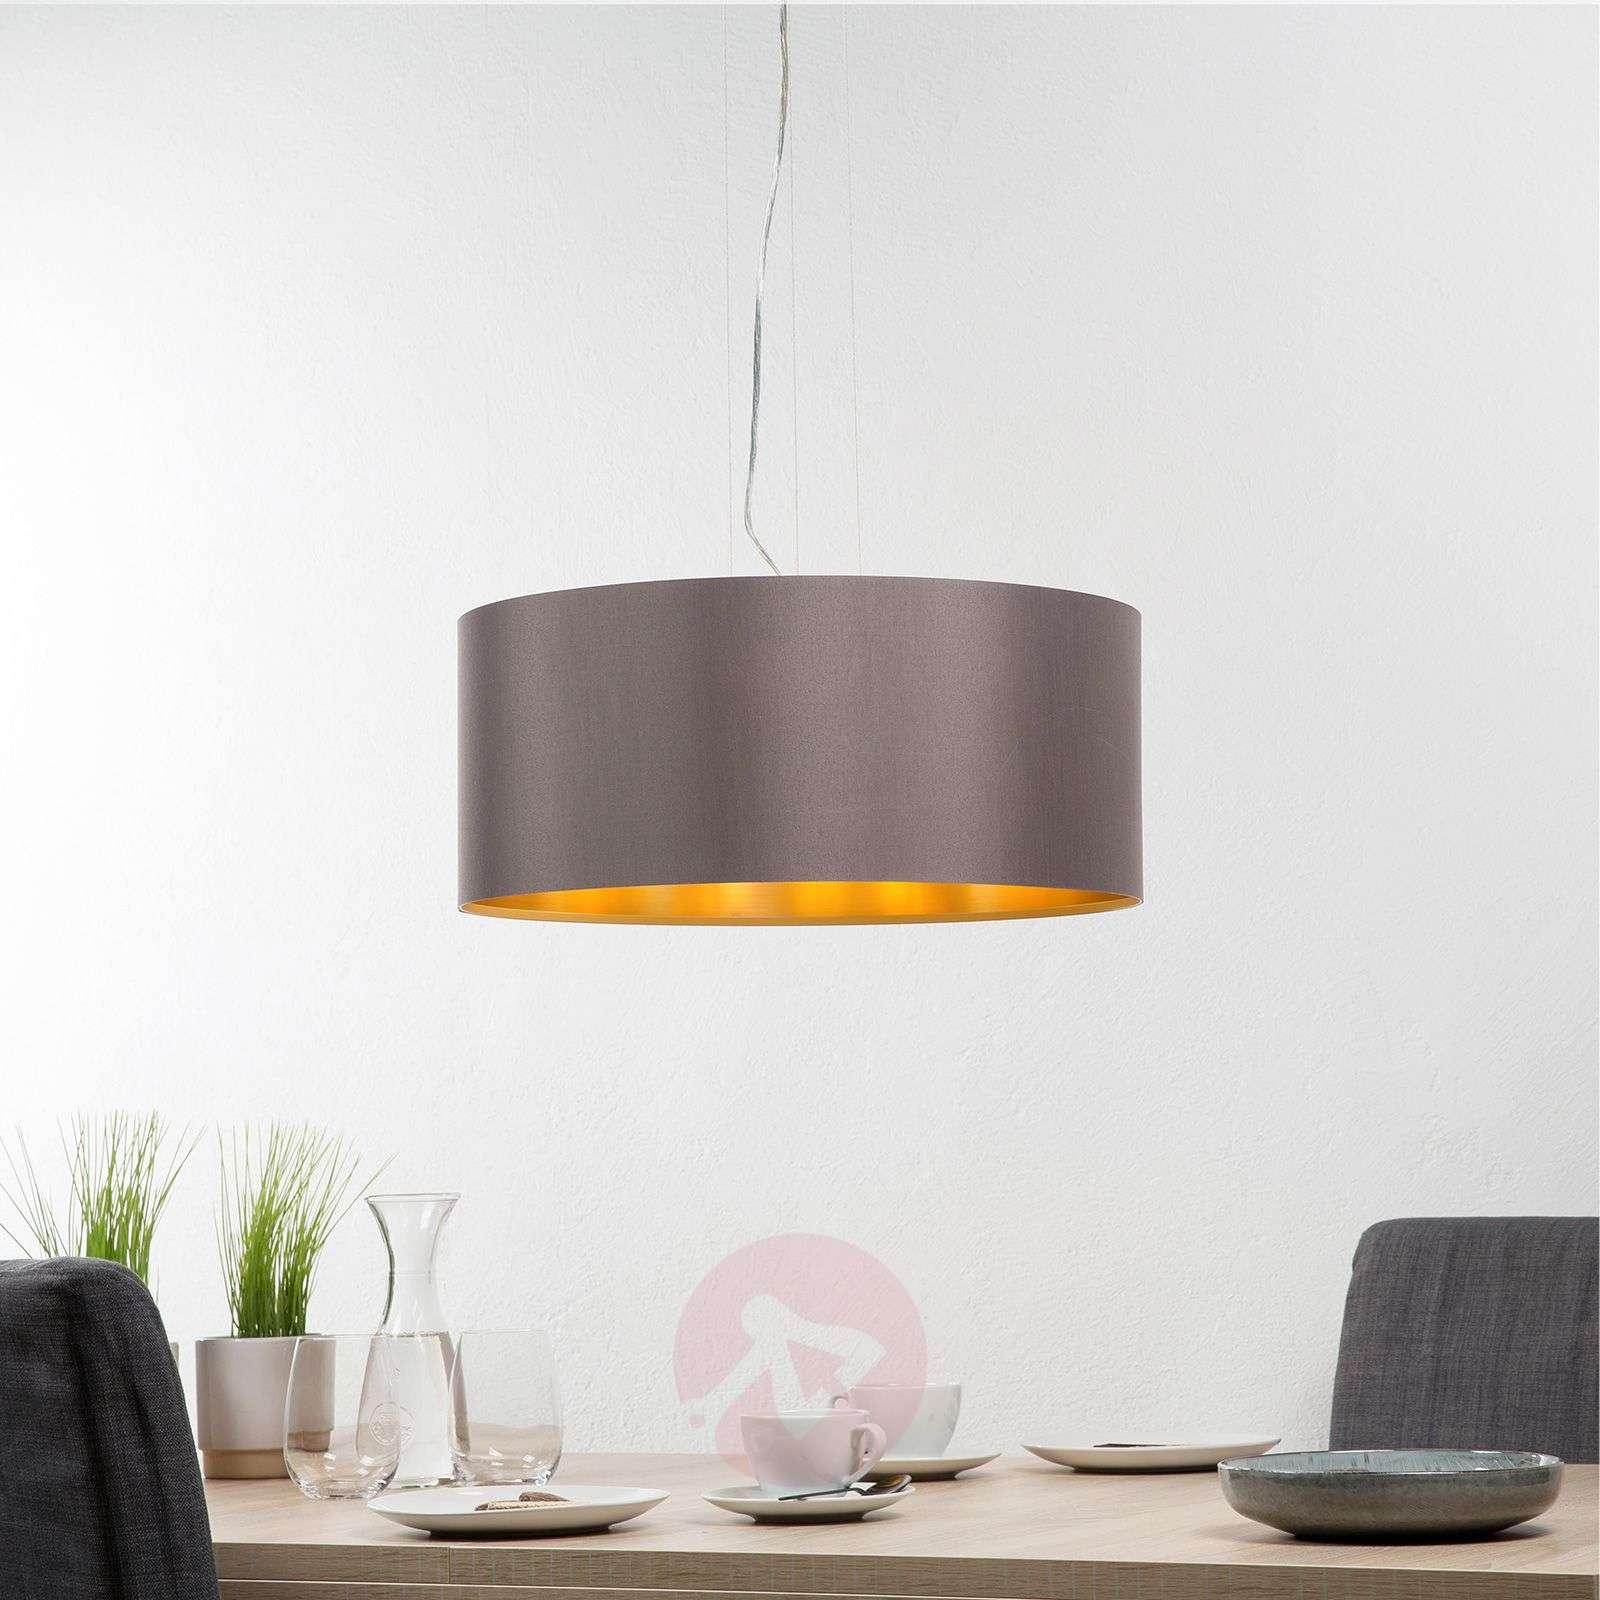 Carpi round fabric hanging light-3031702-02